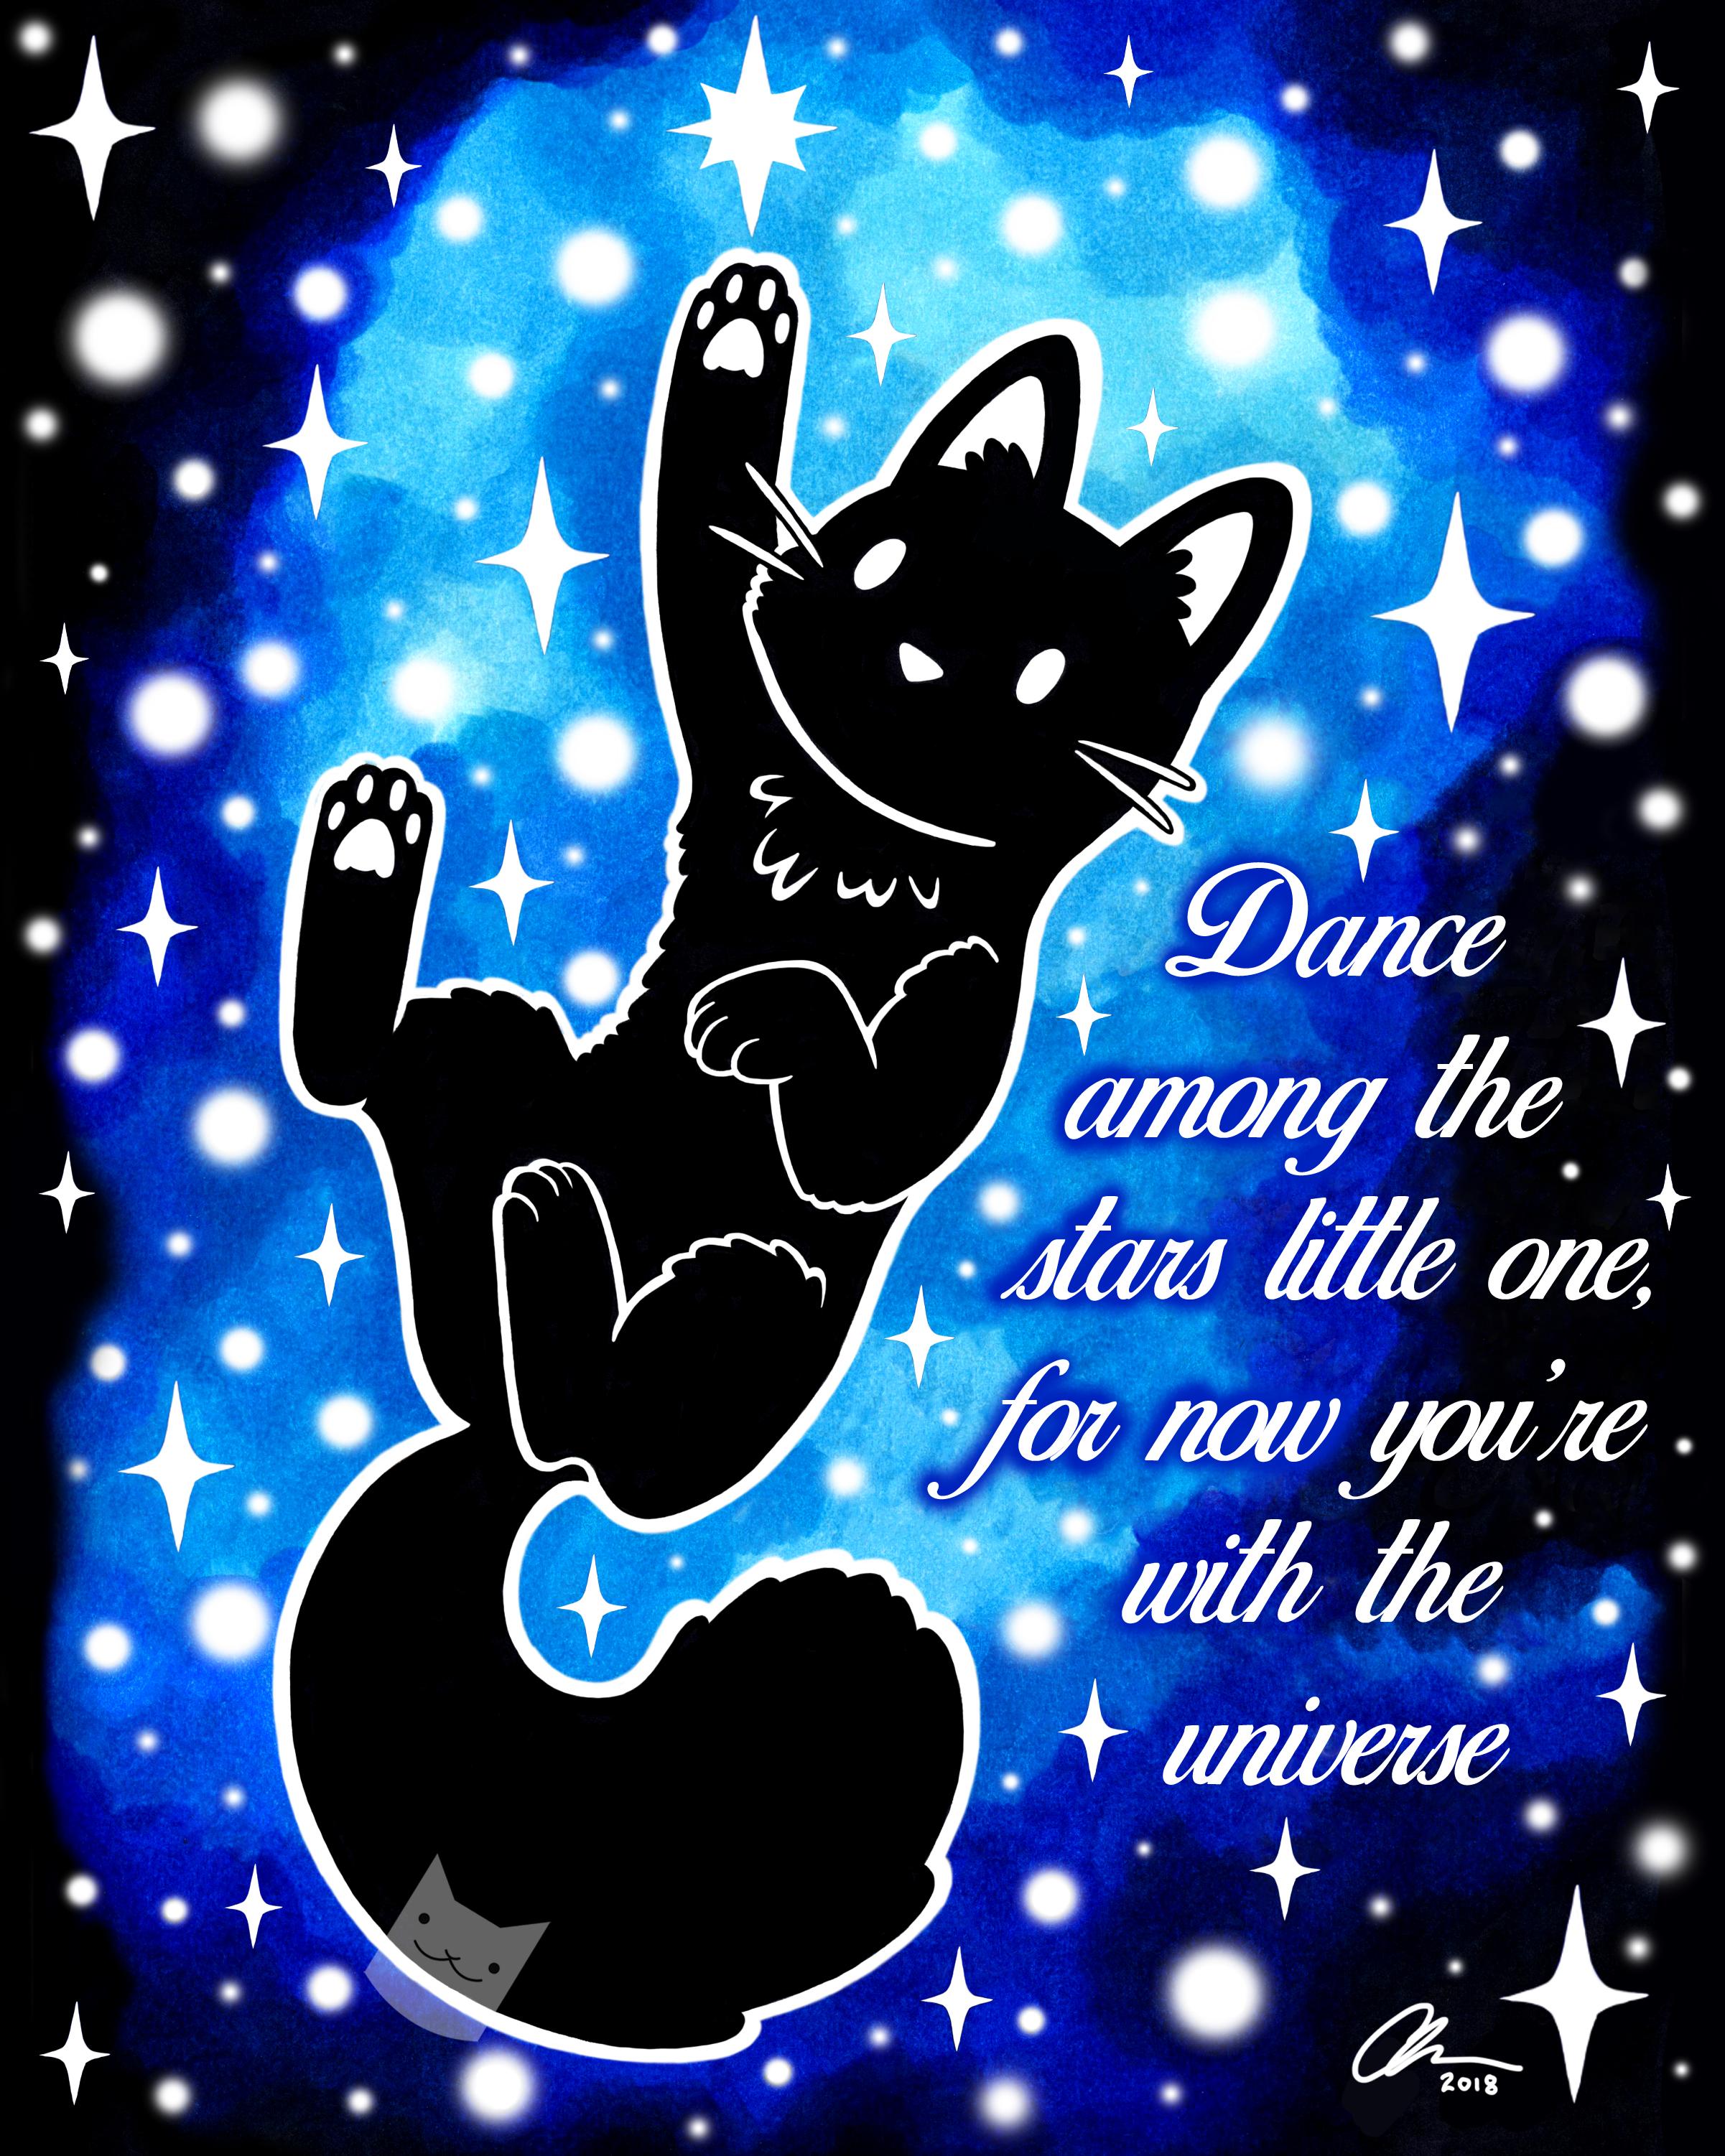 dance among the stars.jpg